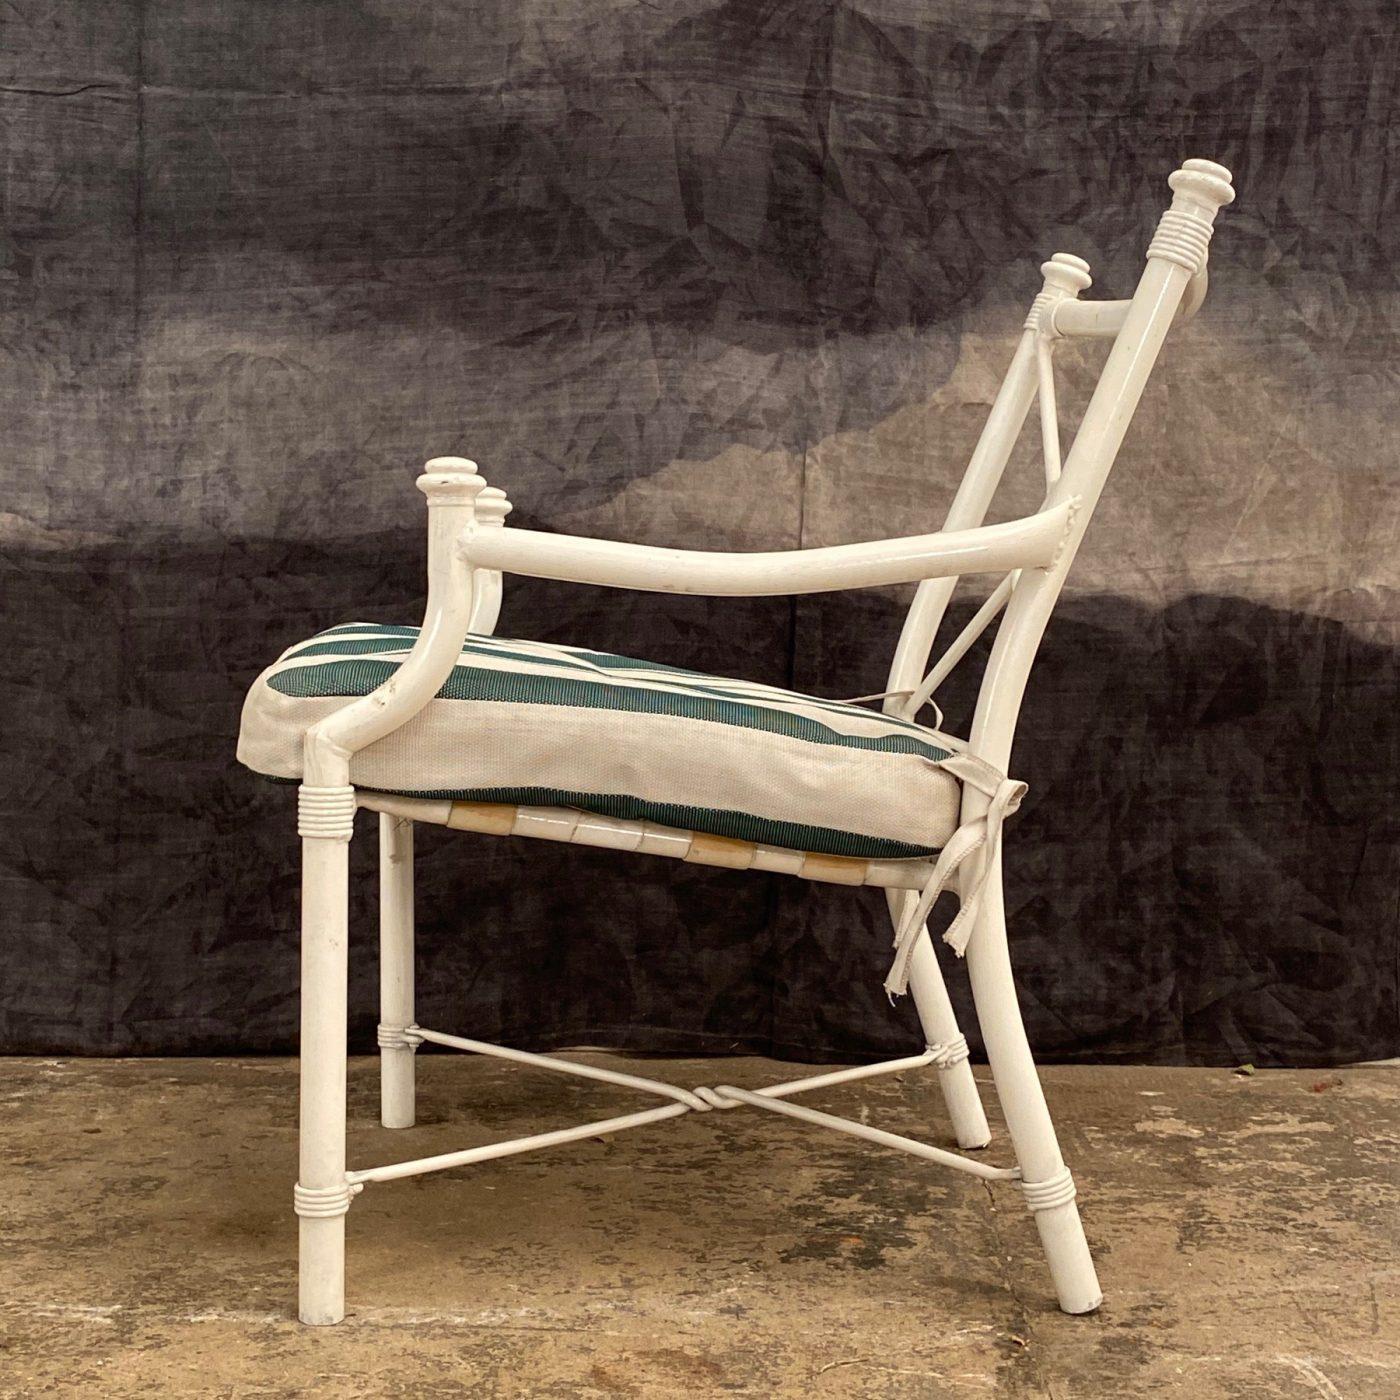 metal-garden-chairs0001